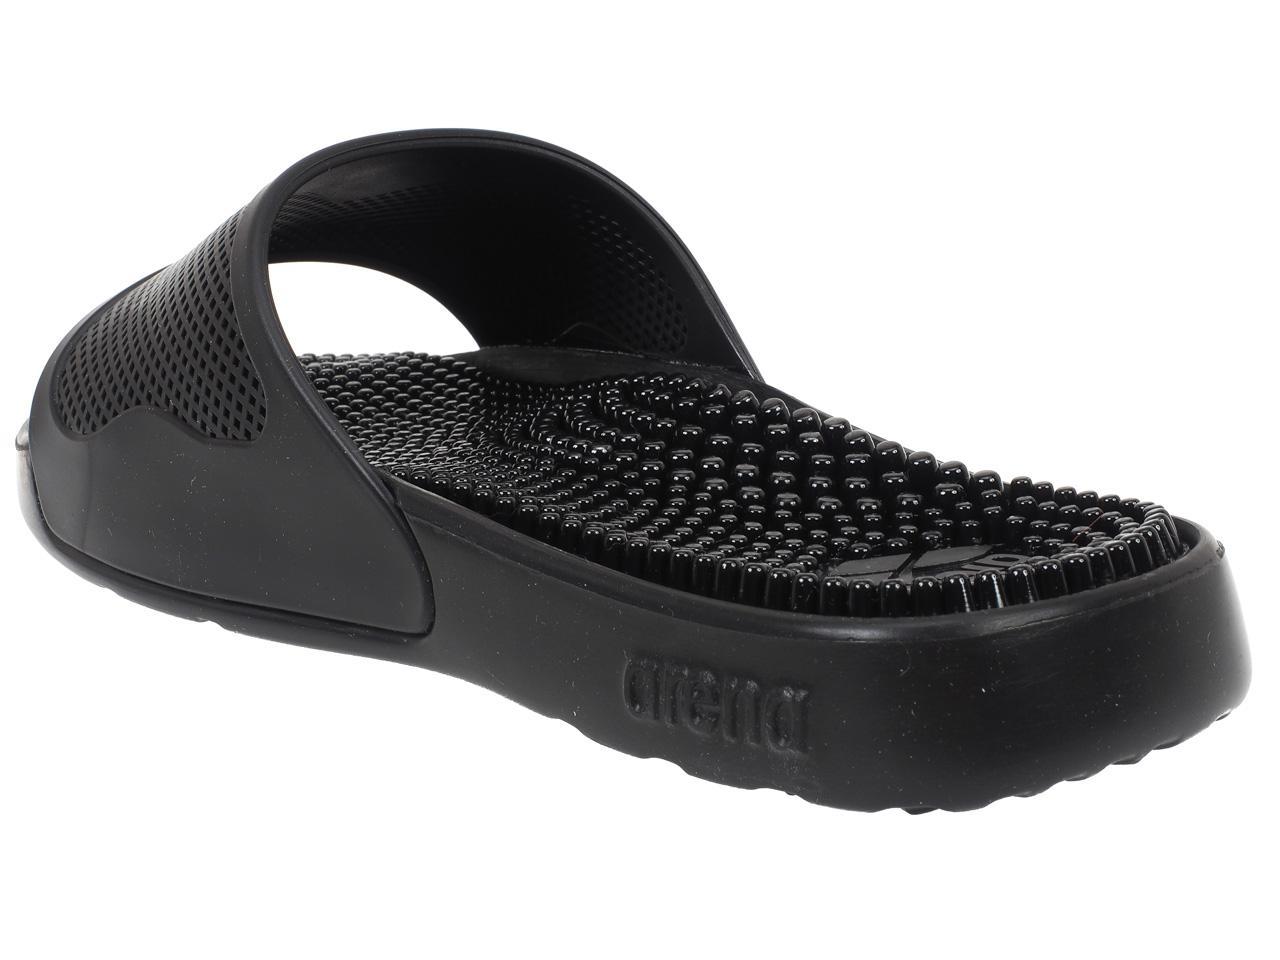 Claquettes-mules-Arena-Marco-x-grip-black-Noir-41316-Neuf miniature 2